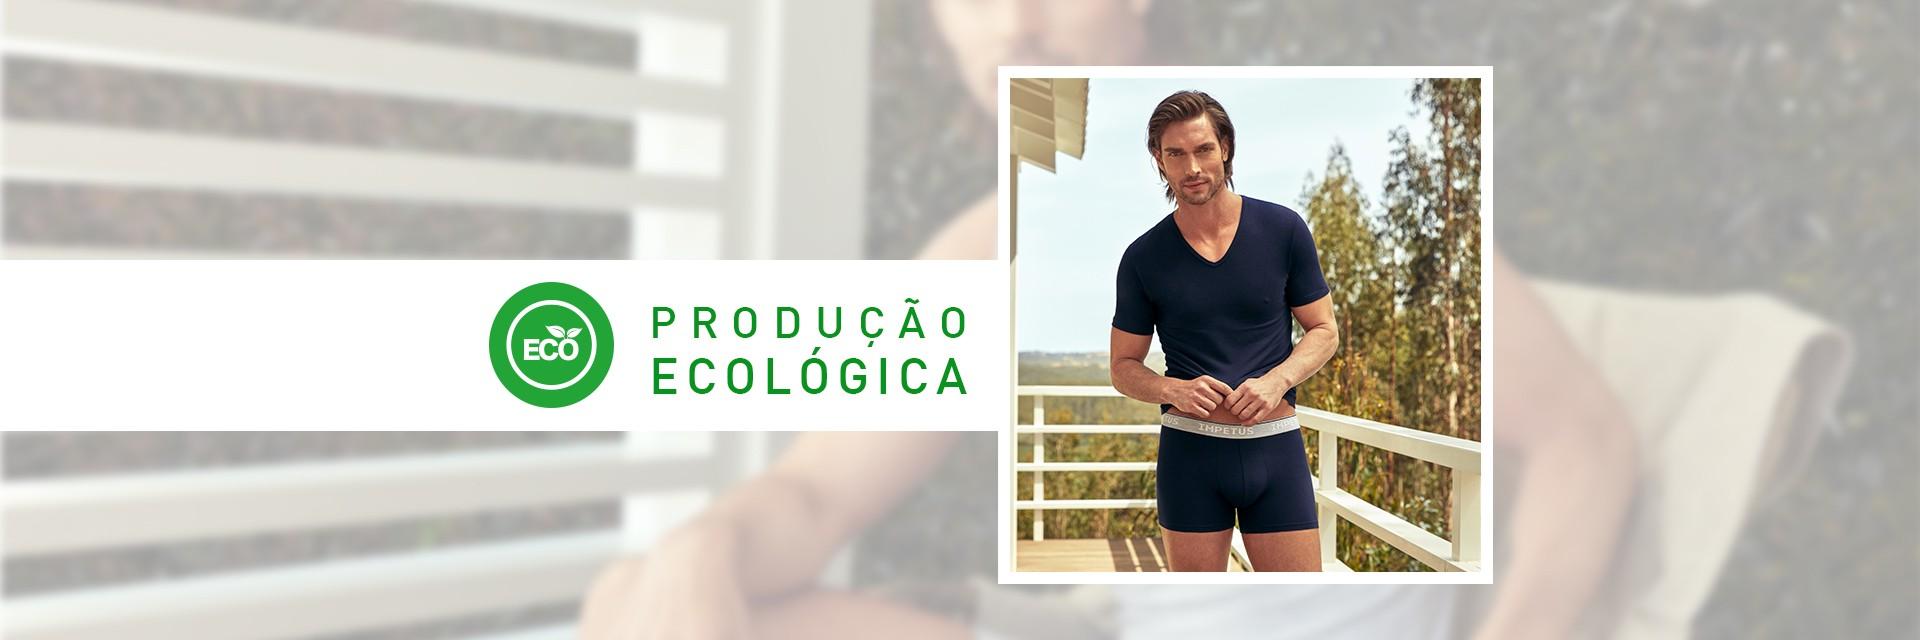 Coleção de roupa interior à base de fibras orgânicas | Impetus Underwear_1